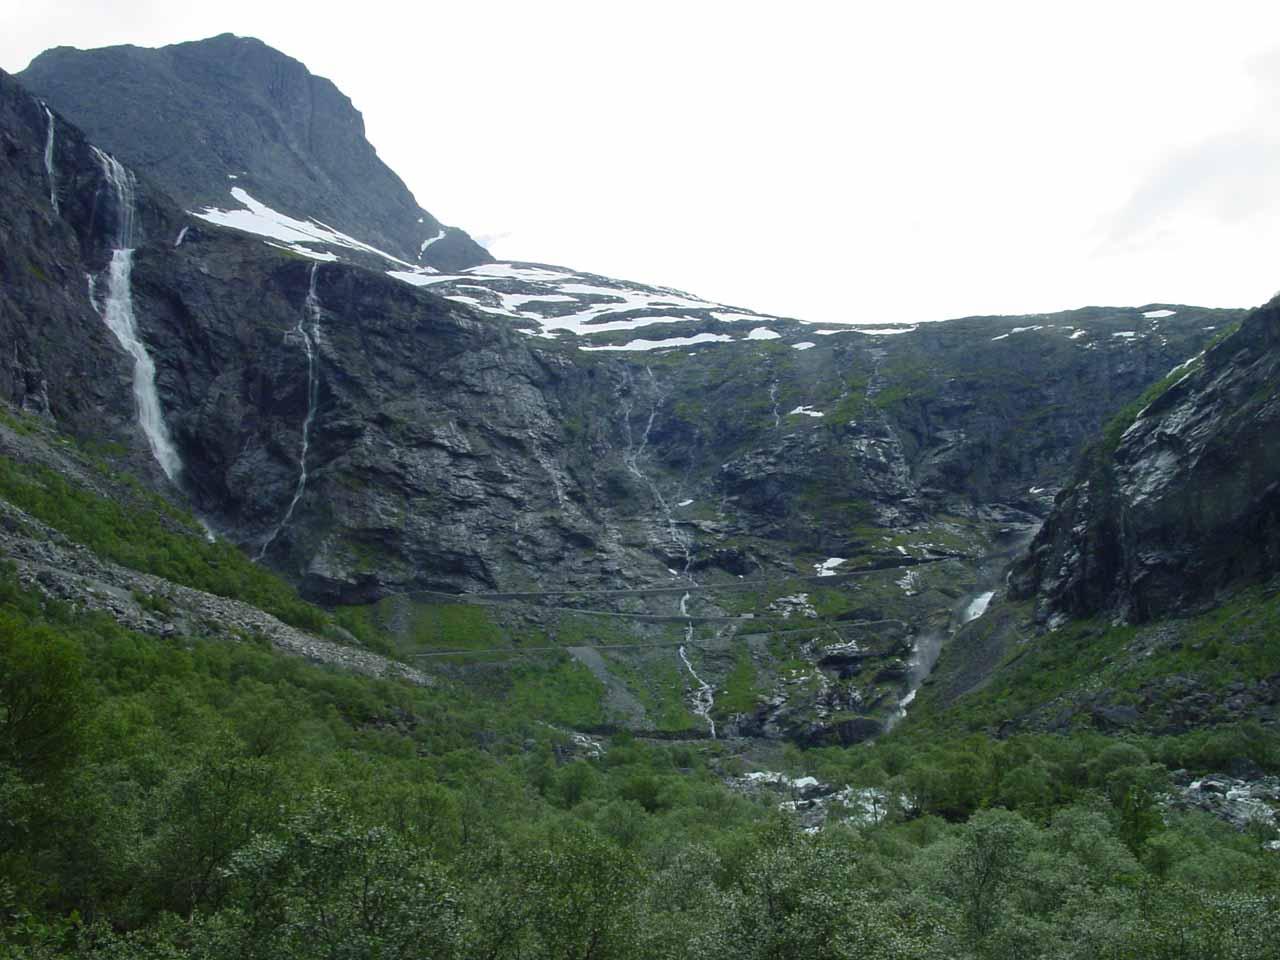 Approaching Trollstigen with Tverrdalsfossen to our left